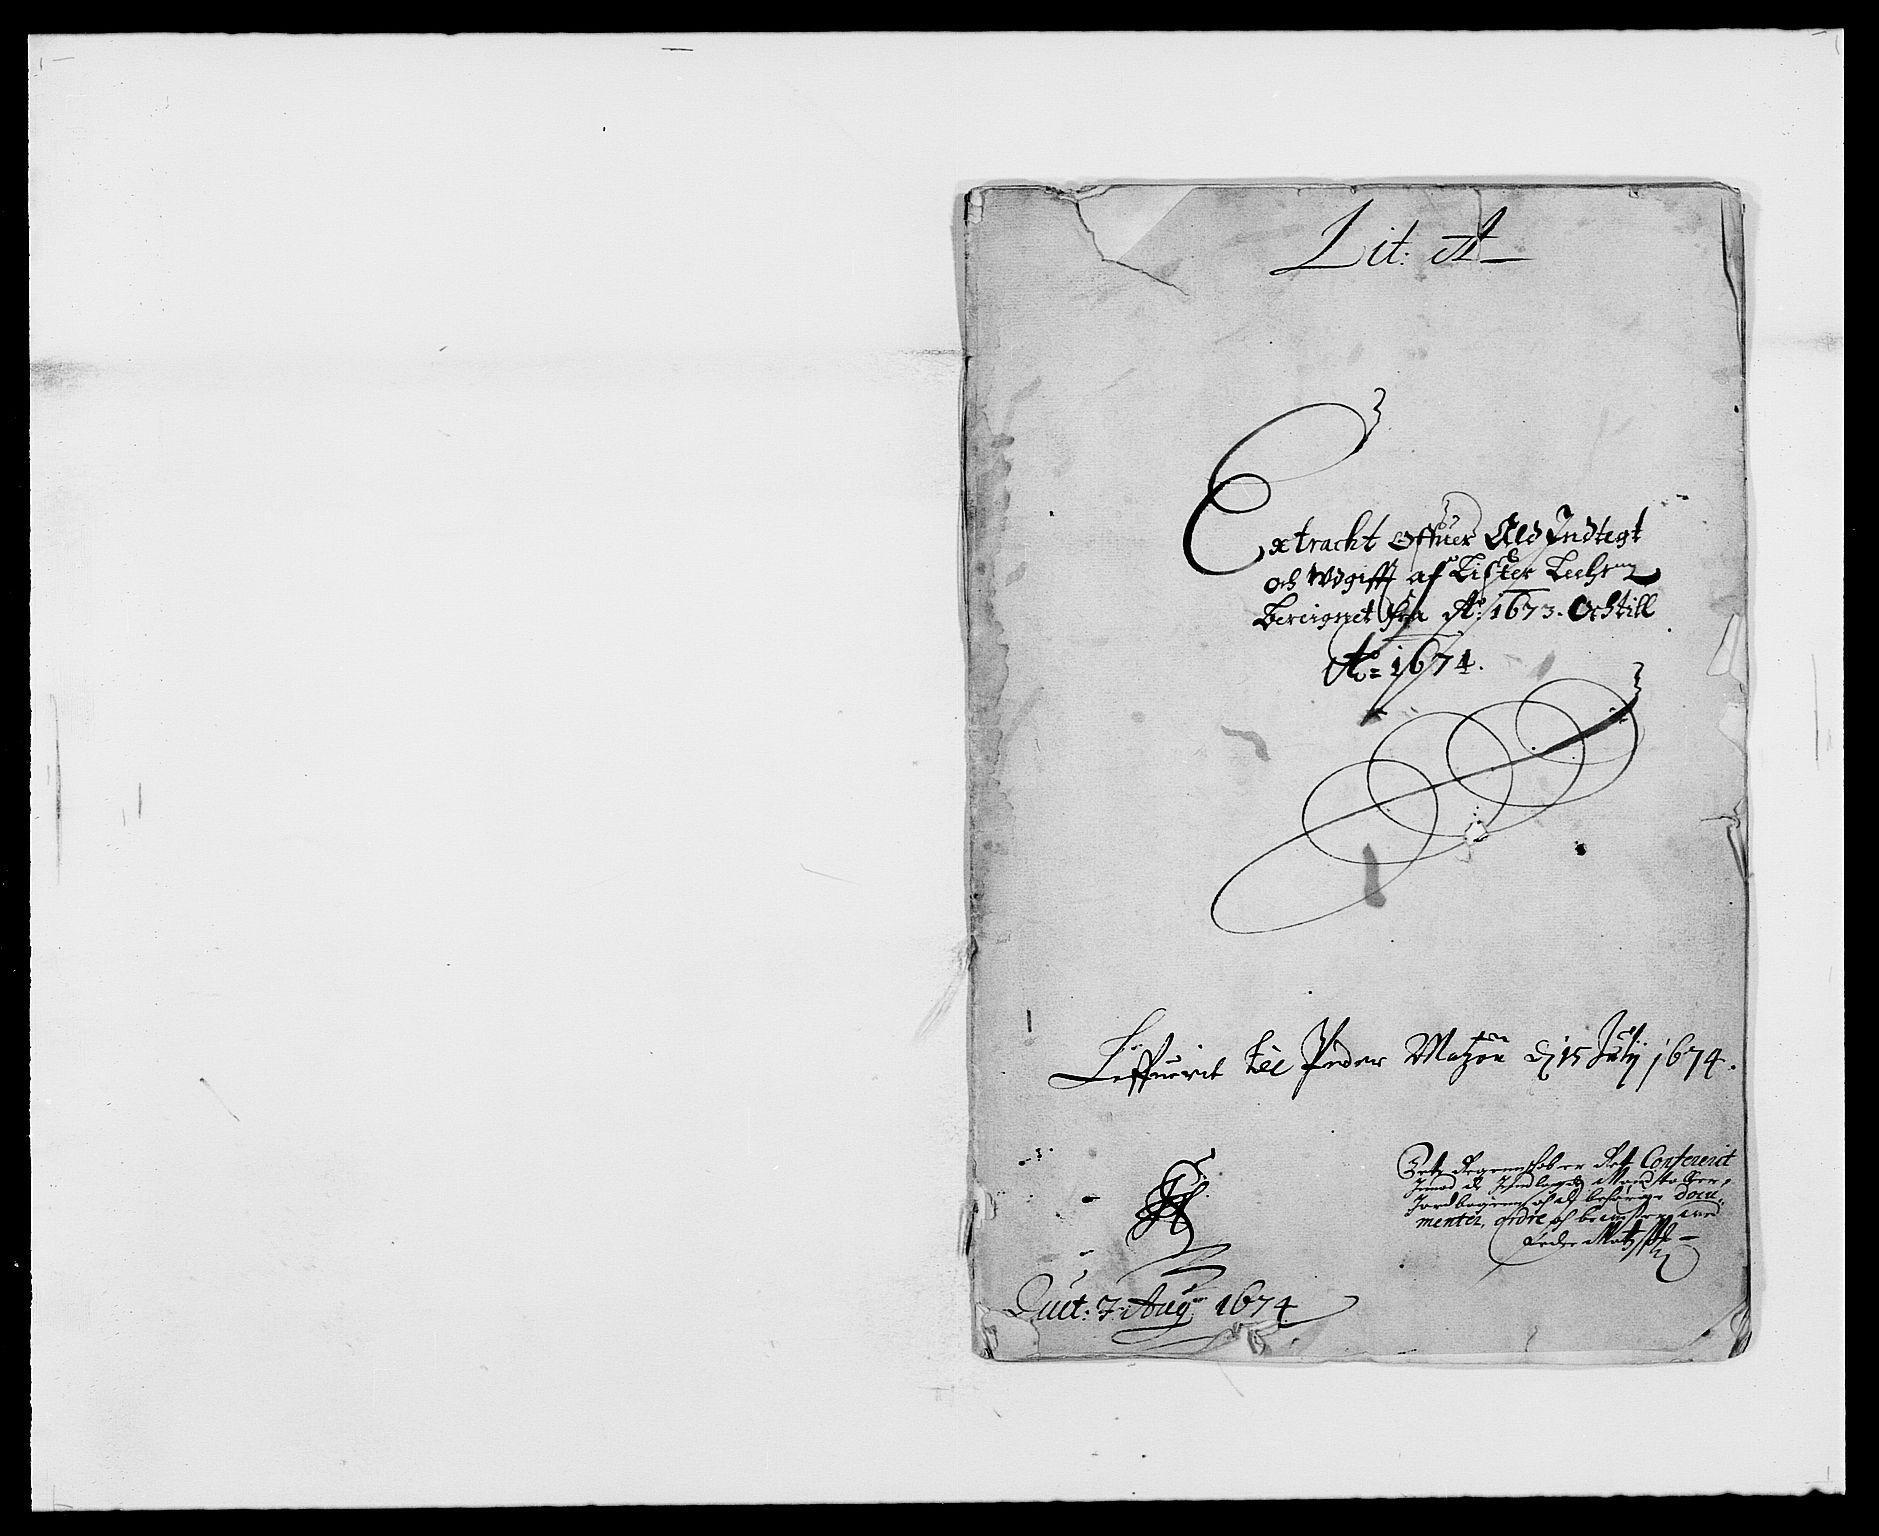 RA, Rentekammeret inntil 1814, Reviderte regnskaper, Fogderegnskap, R41/L2528: Fogderegnskap Lista, 1673-1674, s. 1